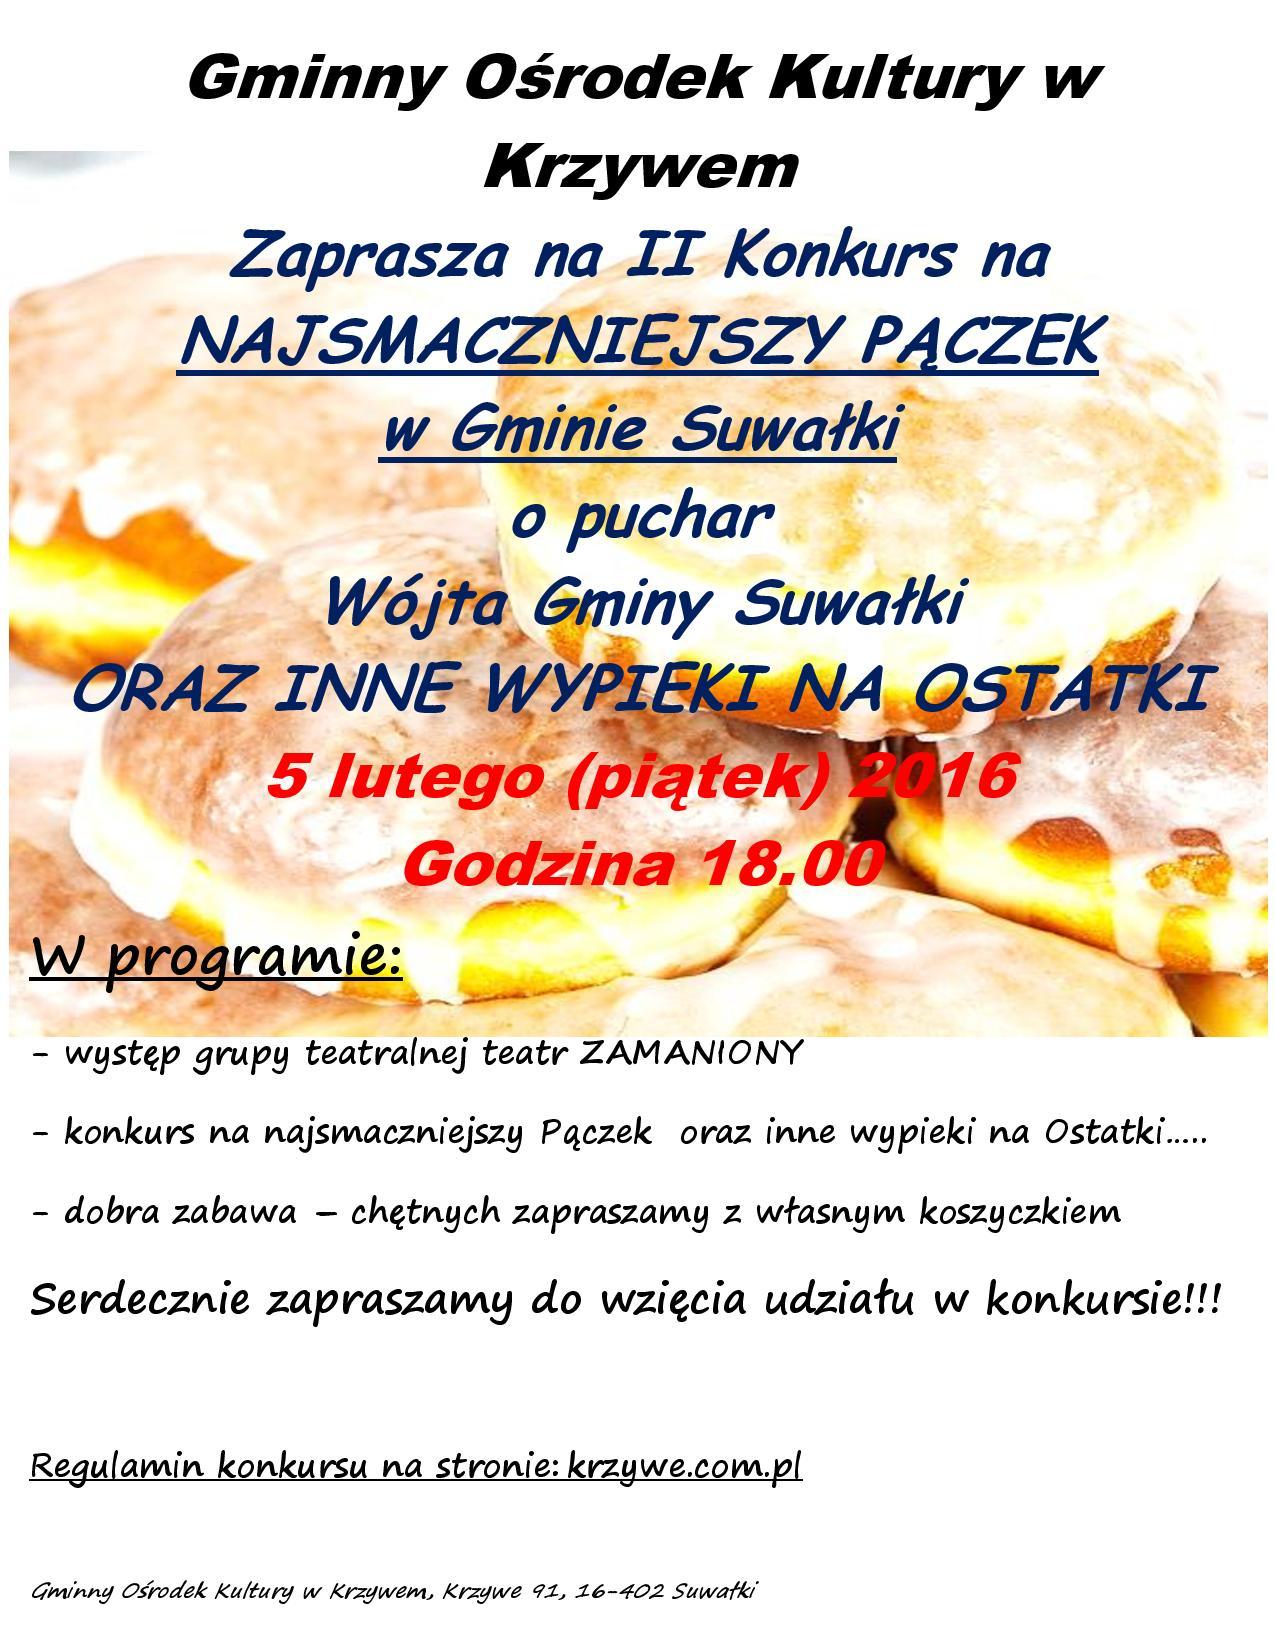 okplakat paczek-page-001